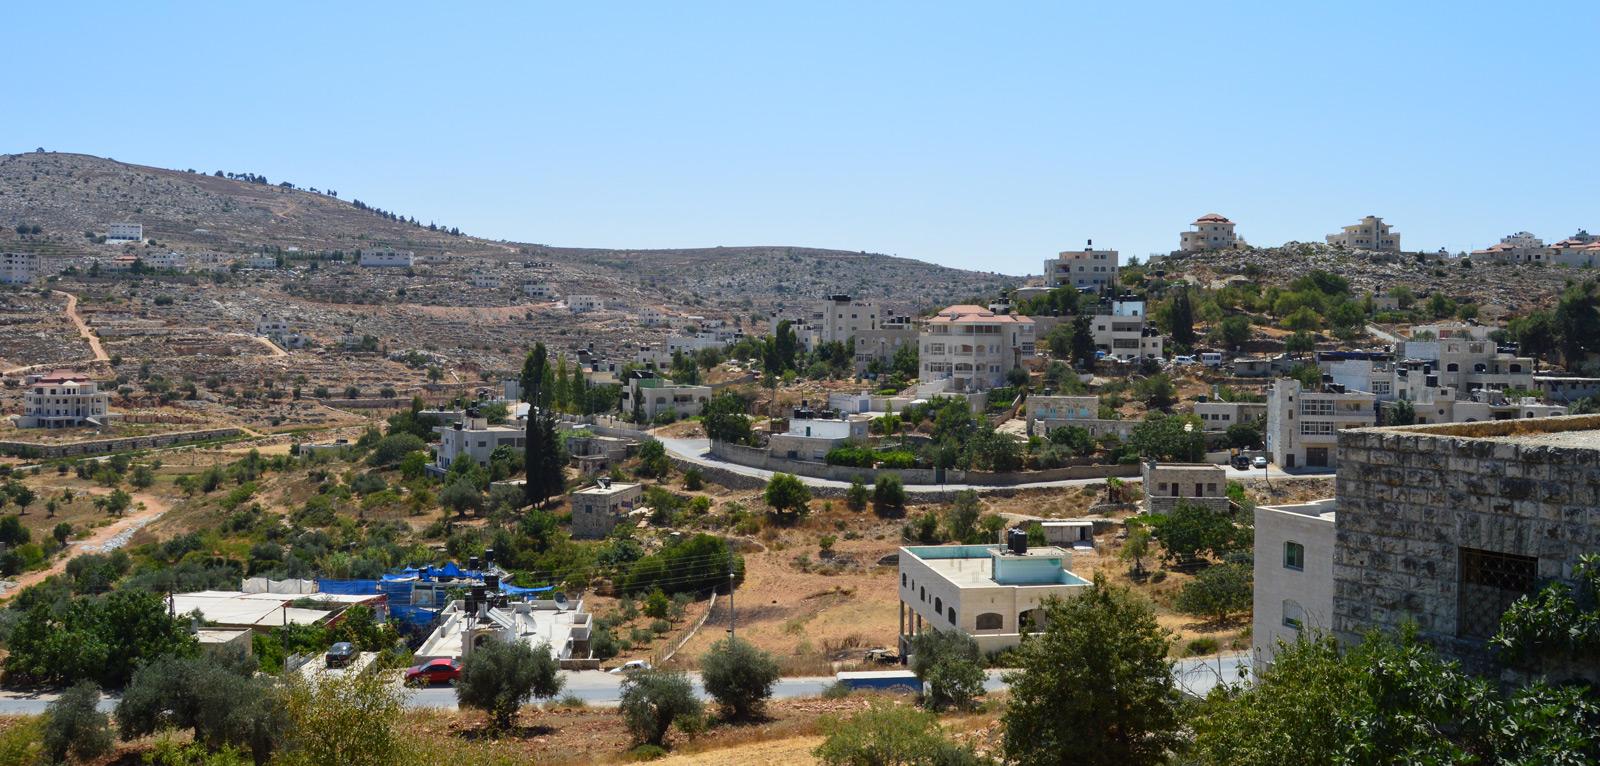 Silwad, Palestine